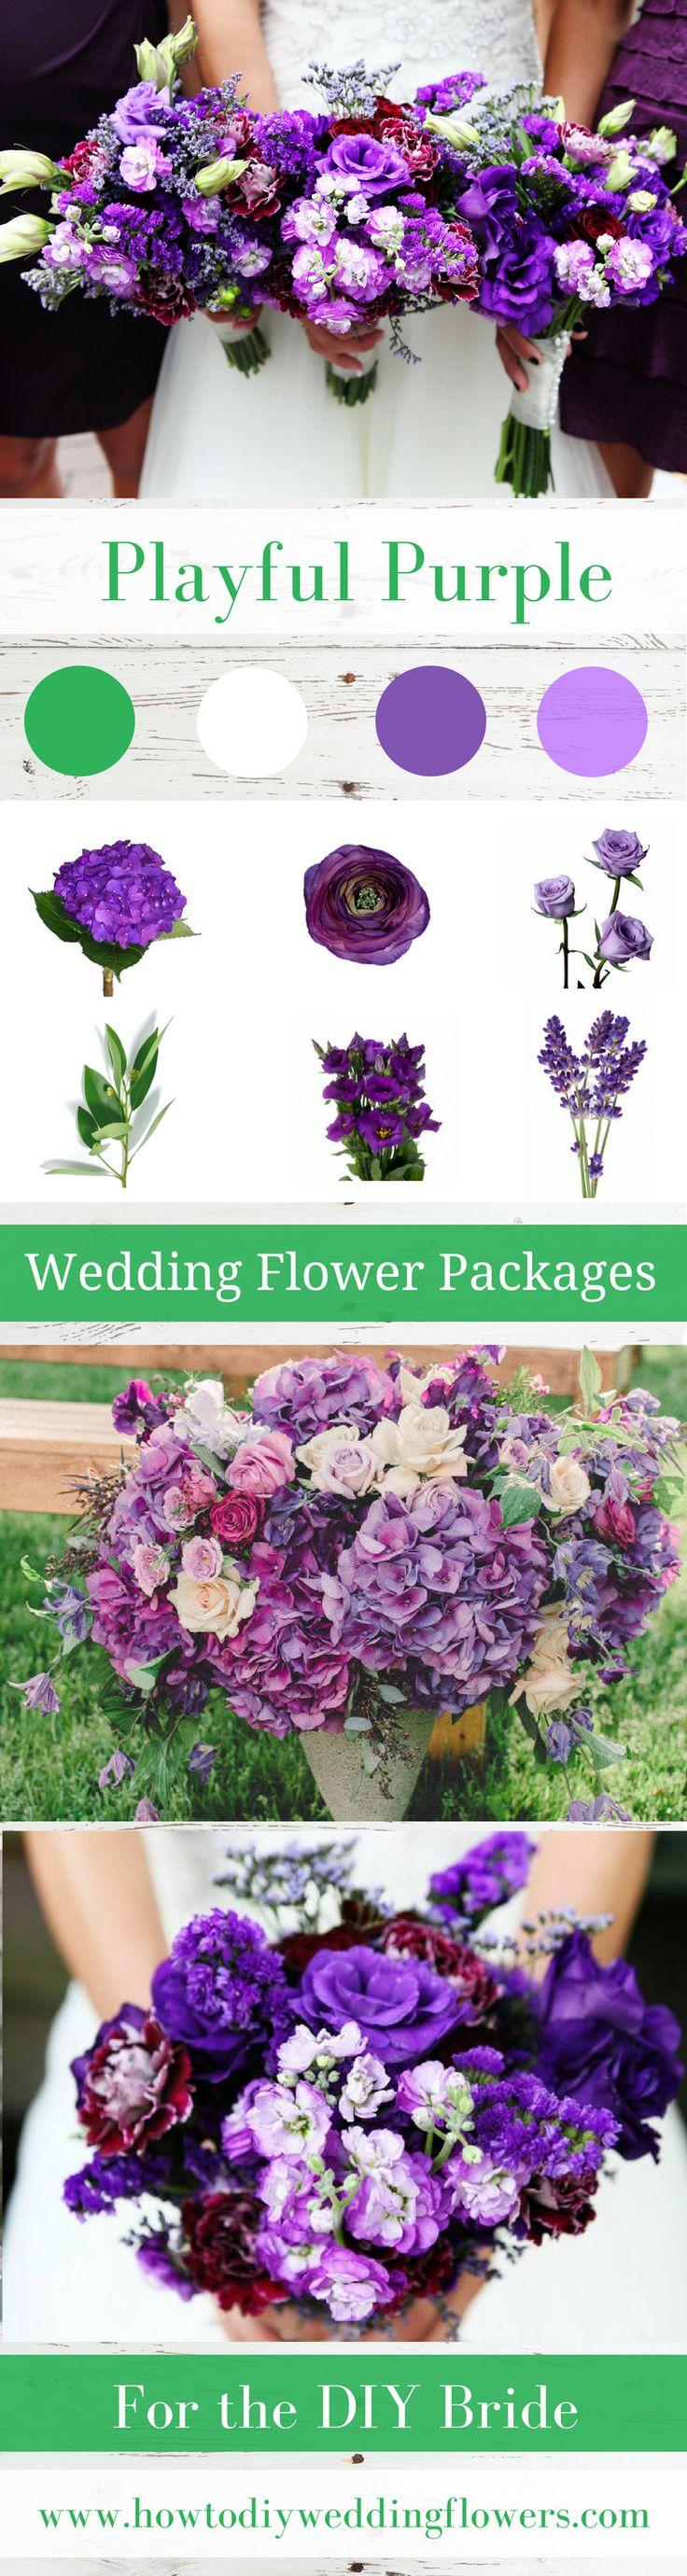 best 25 wedding bouquets online ideas on pinterest green wedding centerpieces wedding. Black Bedroom Furniture Sets. Home Design Ideas